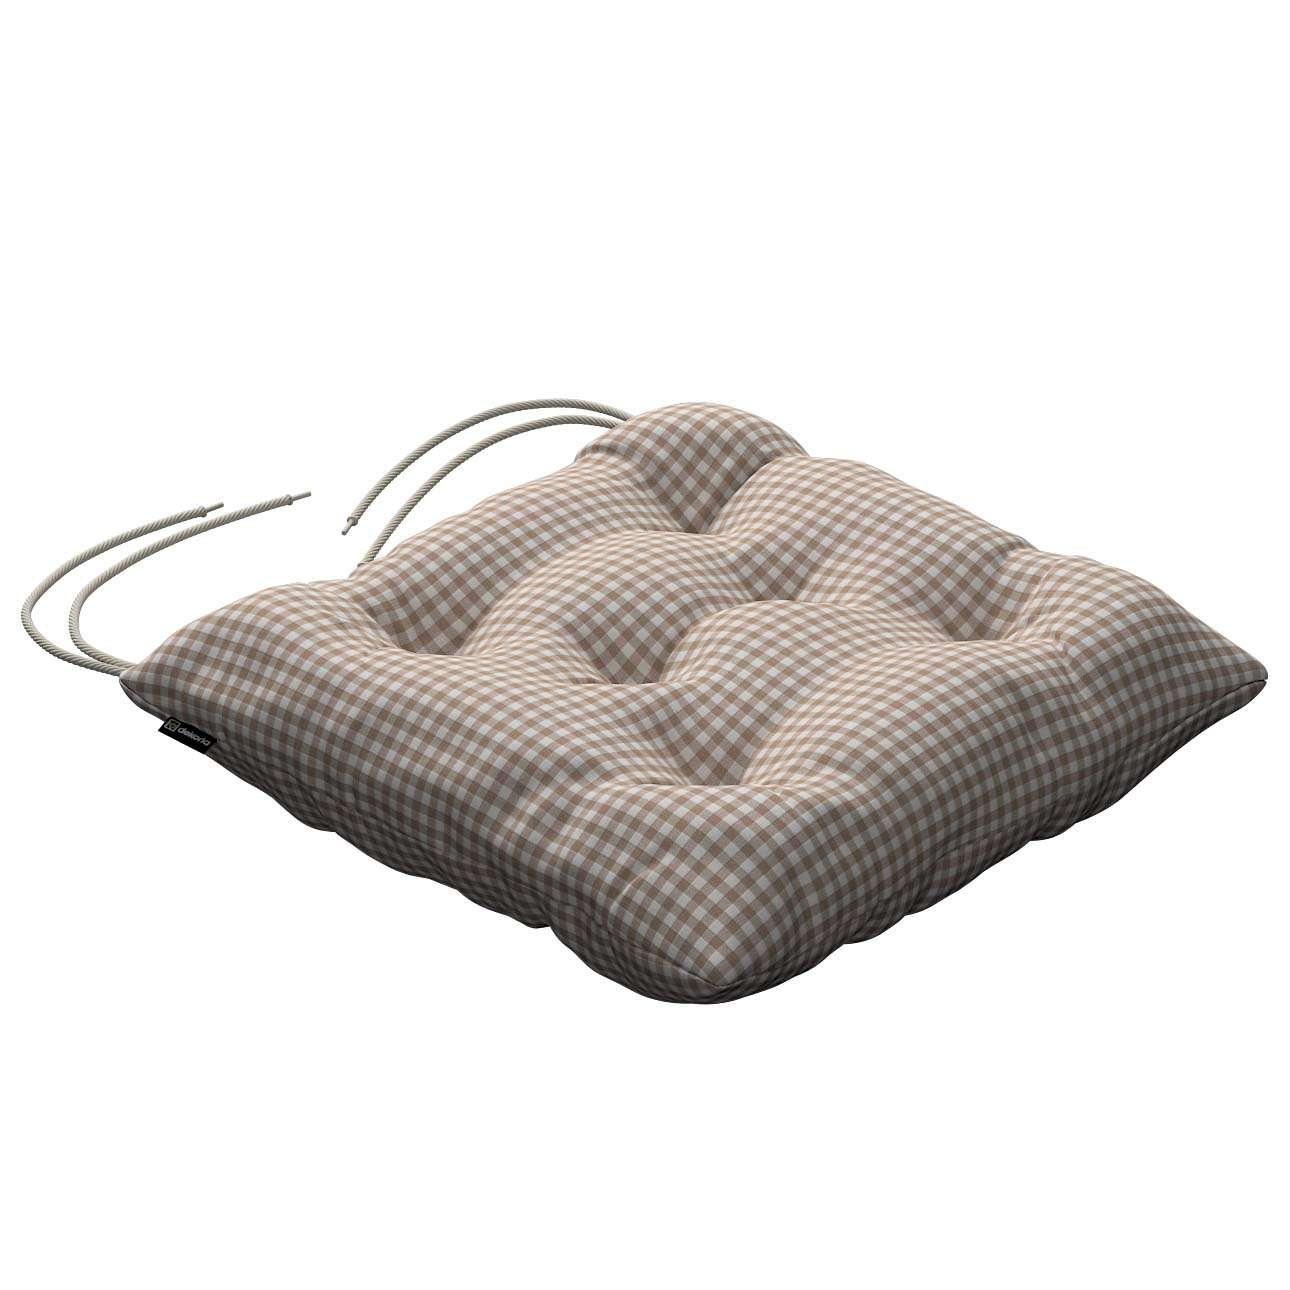 Kėdės pagalvėlė Jacek  40 x 40 x 8 cm kolekcijoje Quadro, audinys: 136-05